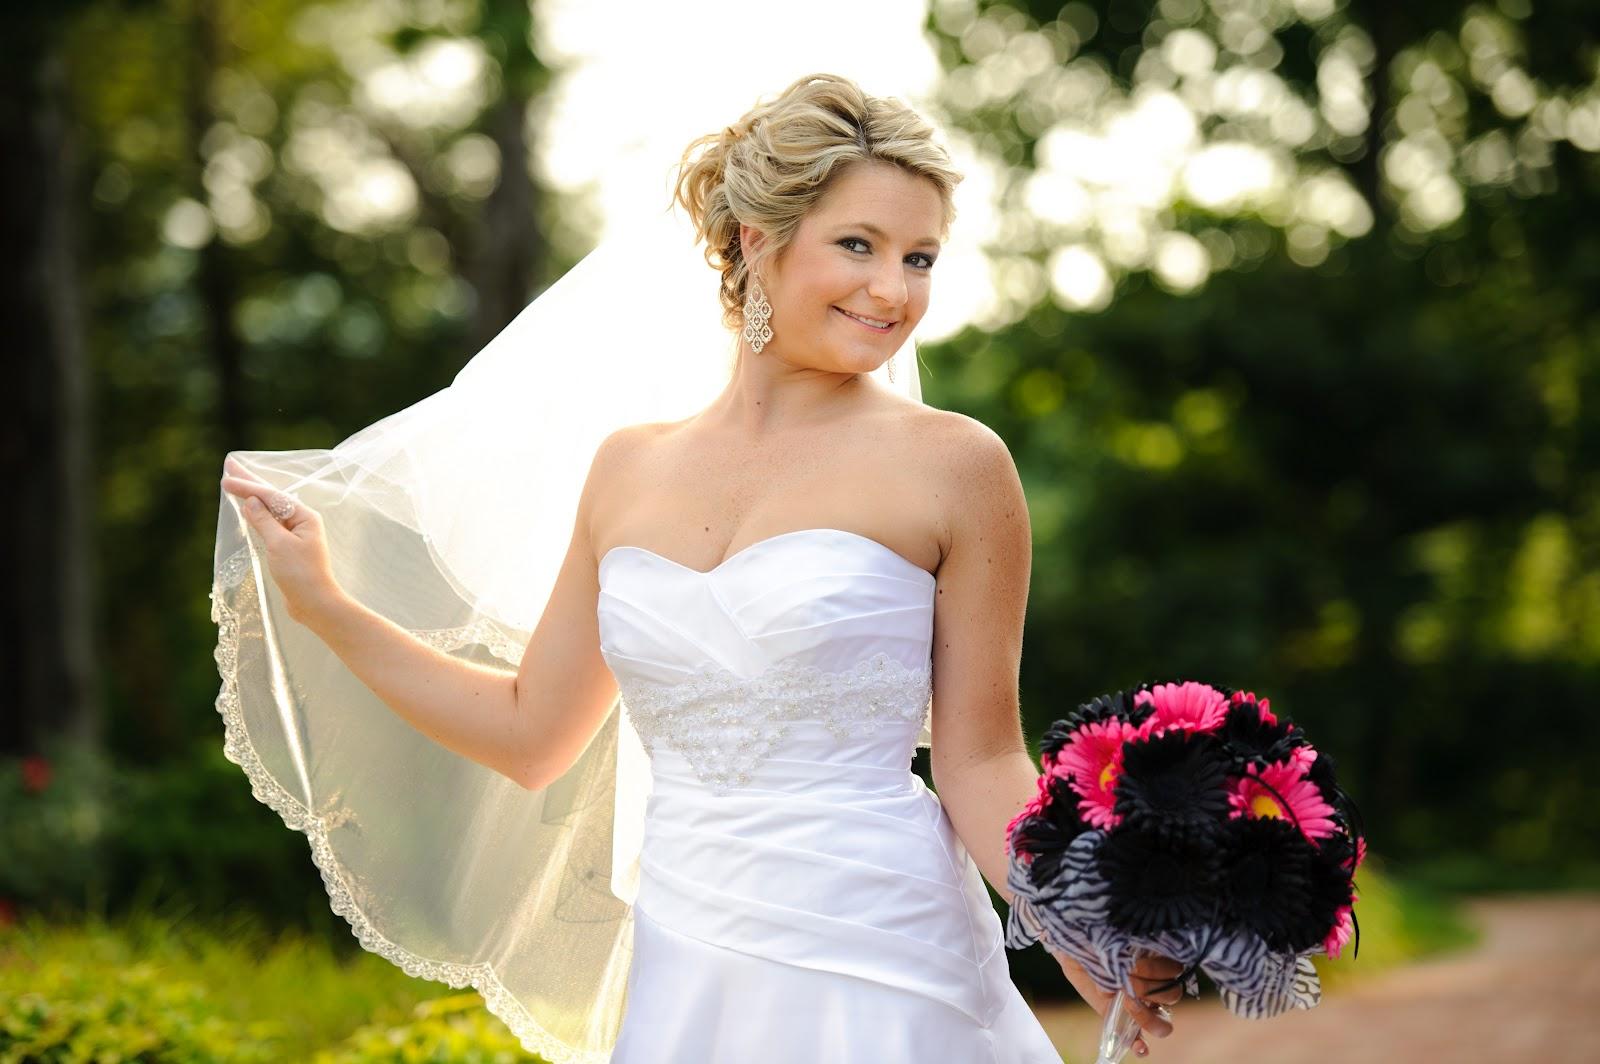 Cable Photography & Video: Jordan Fair - Wedding - Engagement ...